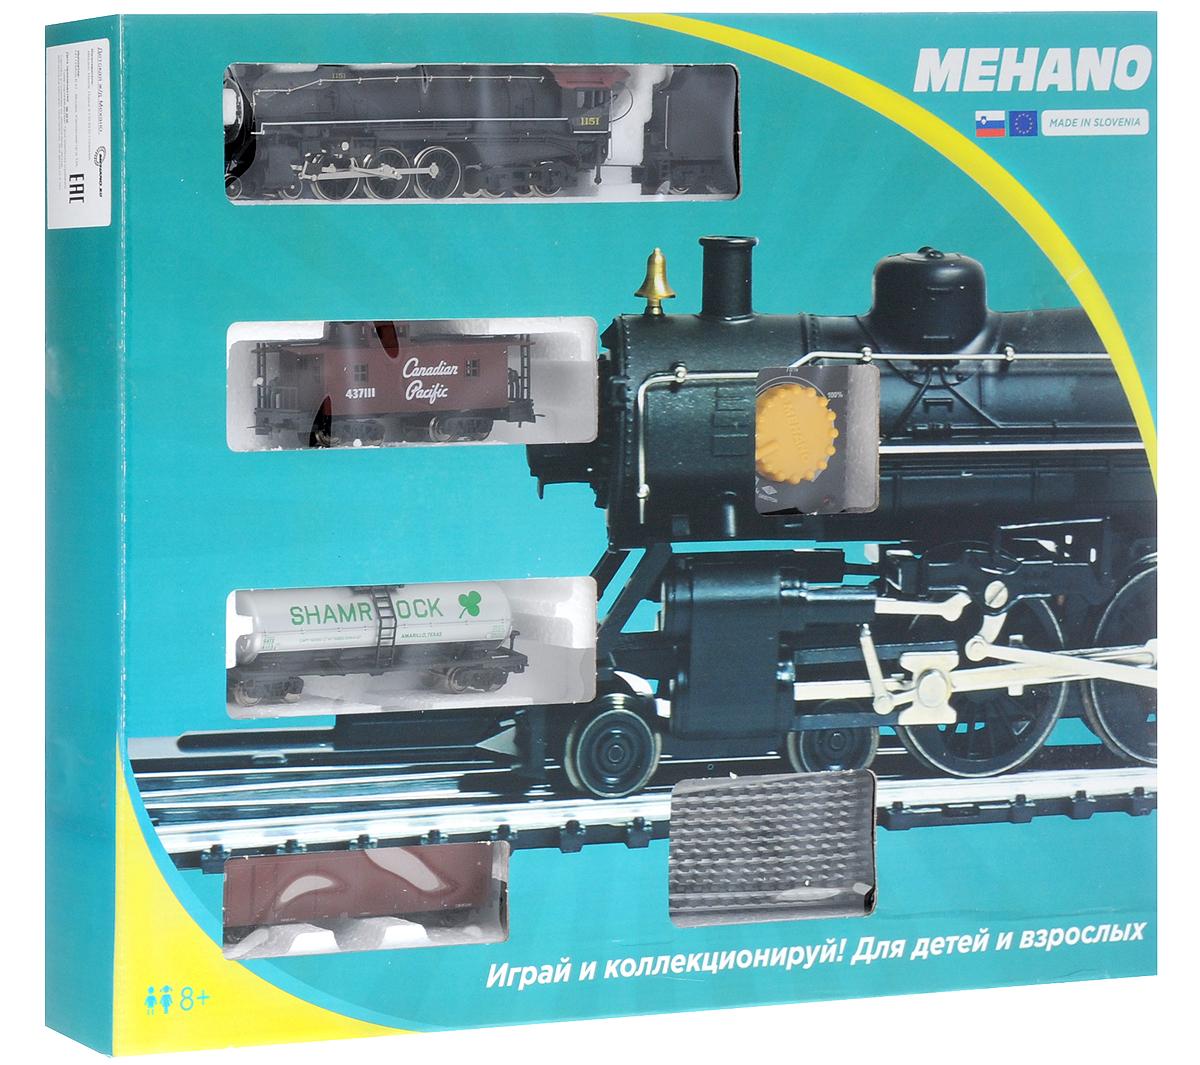 Mehano Железная дорога Prestige с паровозом Lackawanna 1151